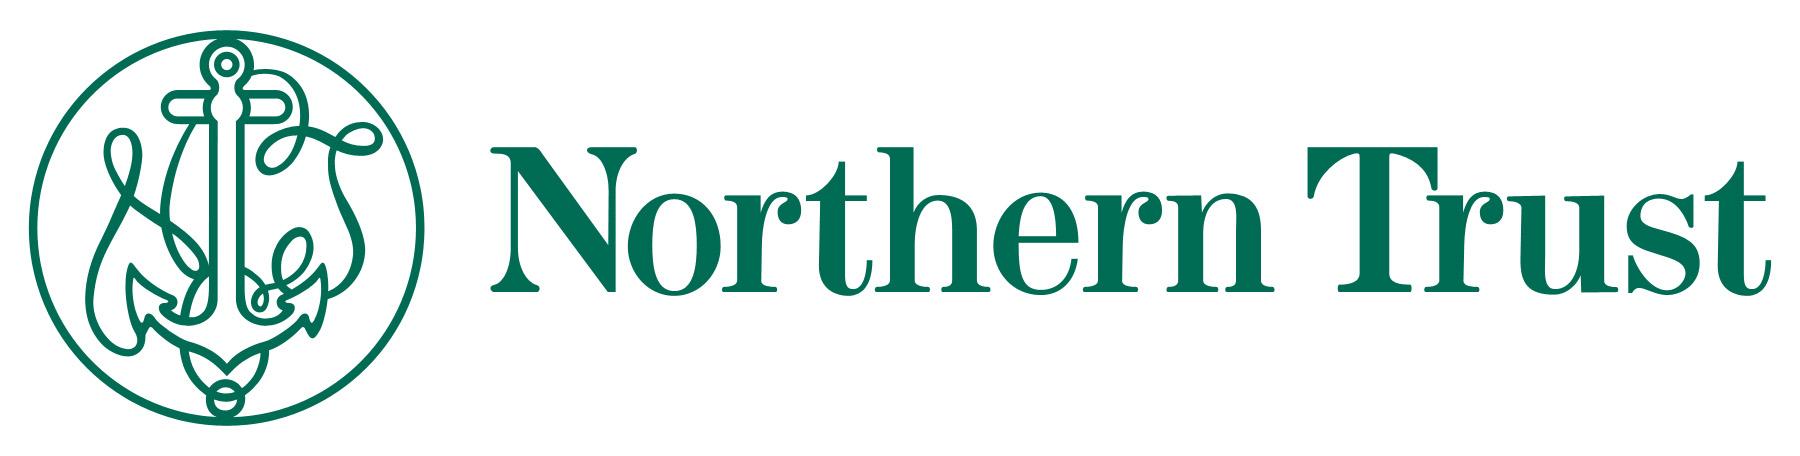 Northern_Trust